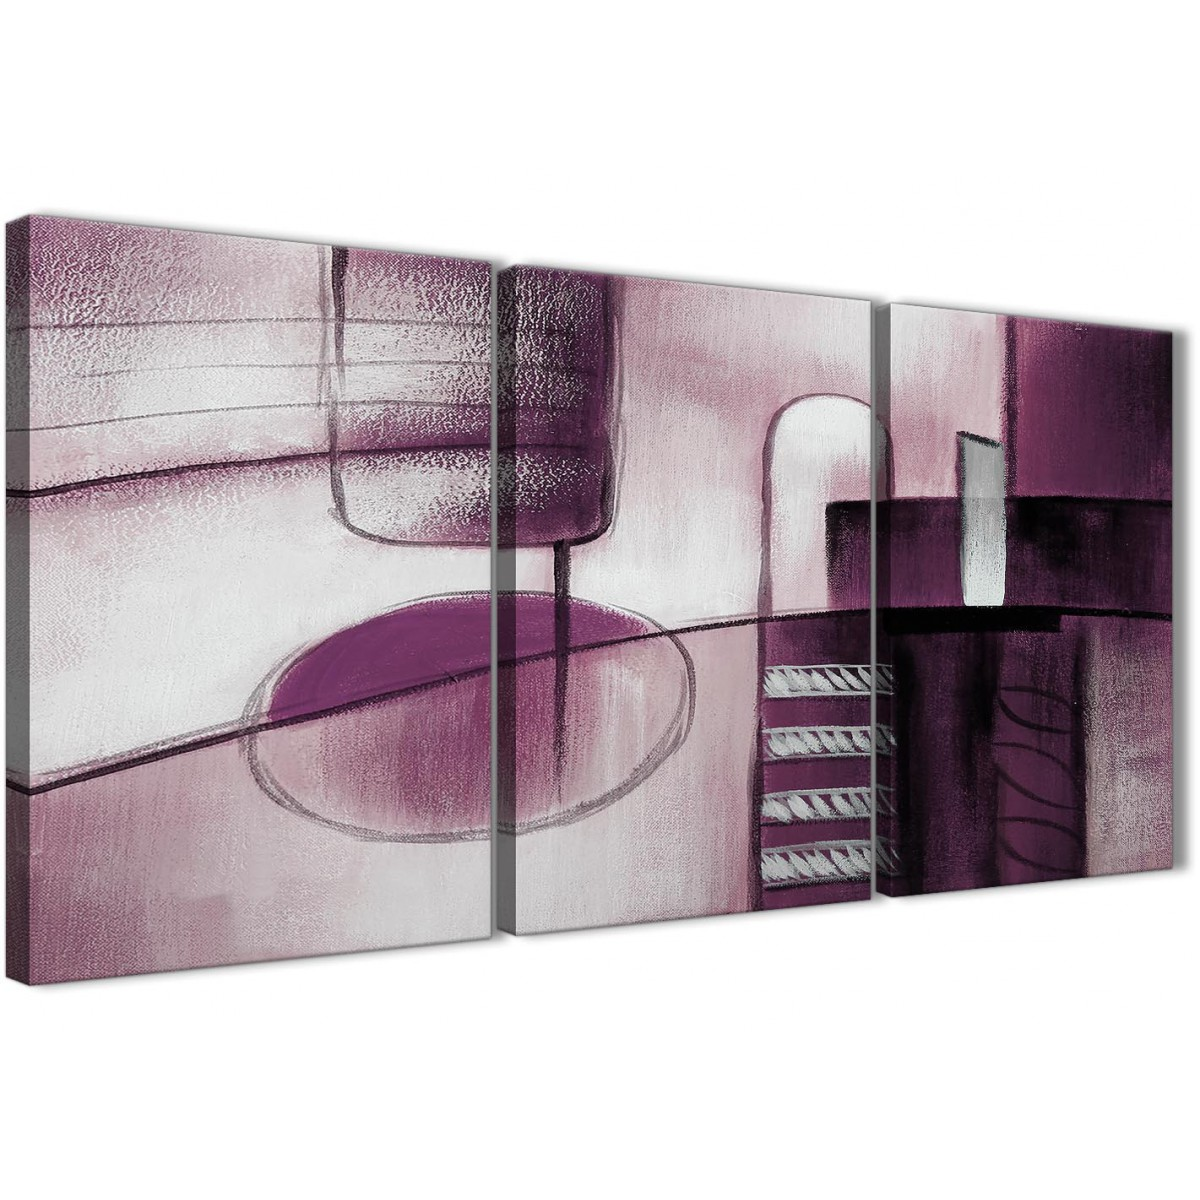 Plum Purple Grey Painting Kitchen Canvas Pictures: 3 Piece Plum Grey Painting Hallway Canvas Pictures Decor